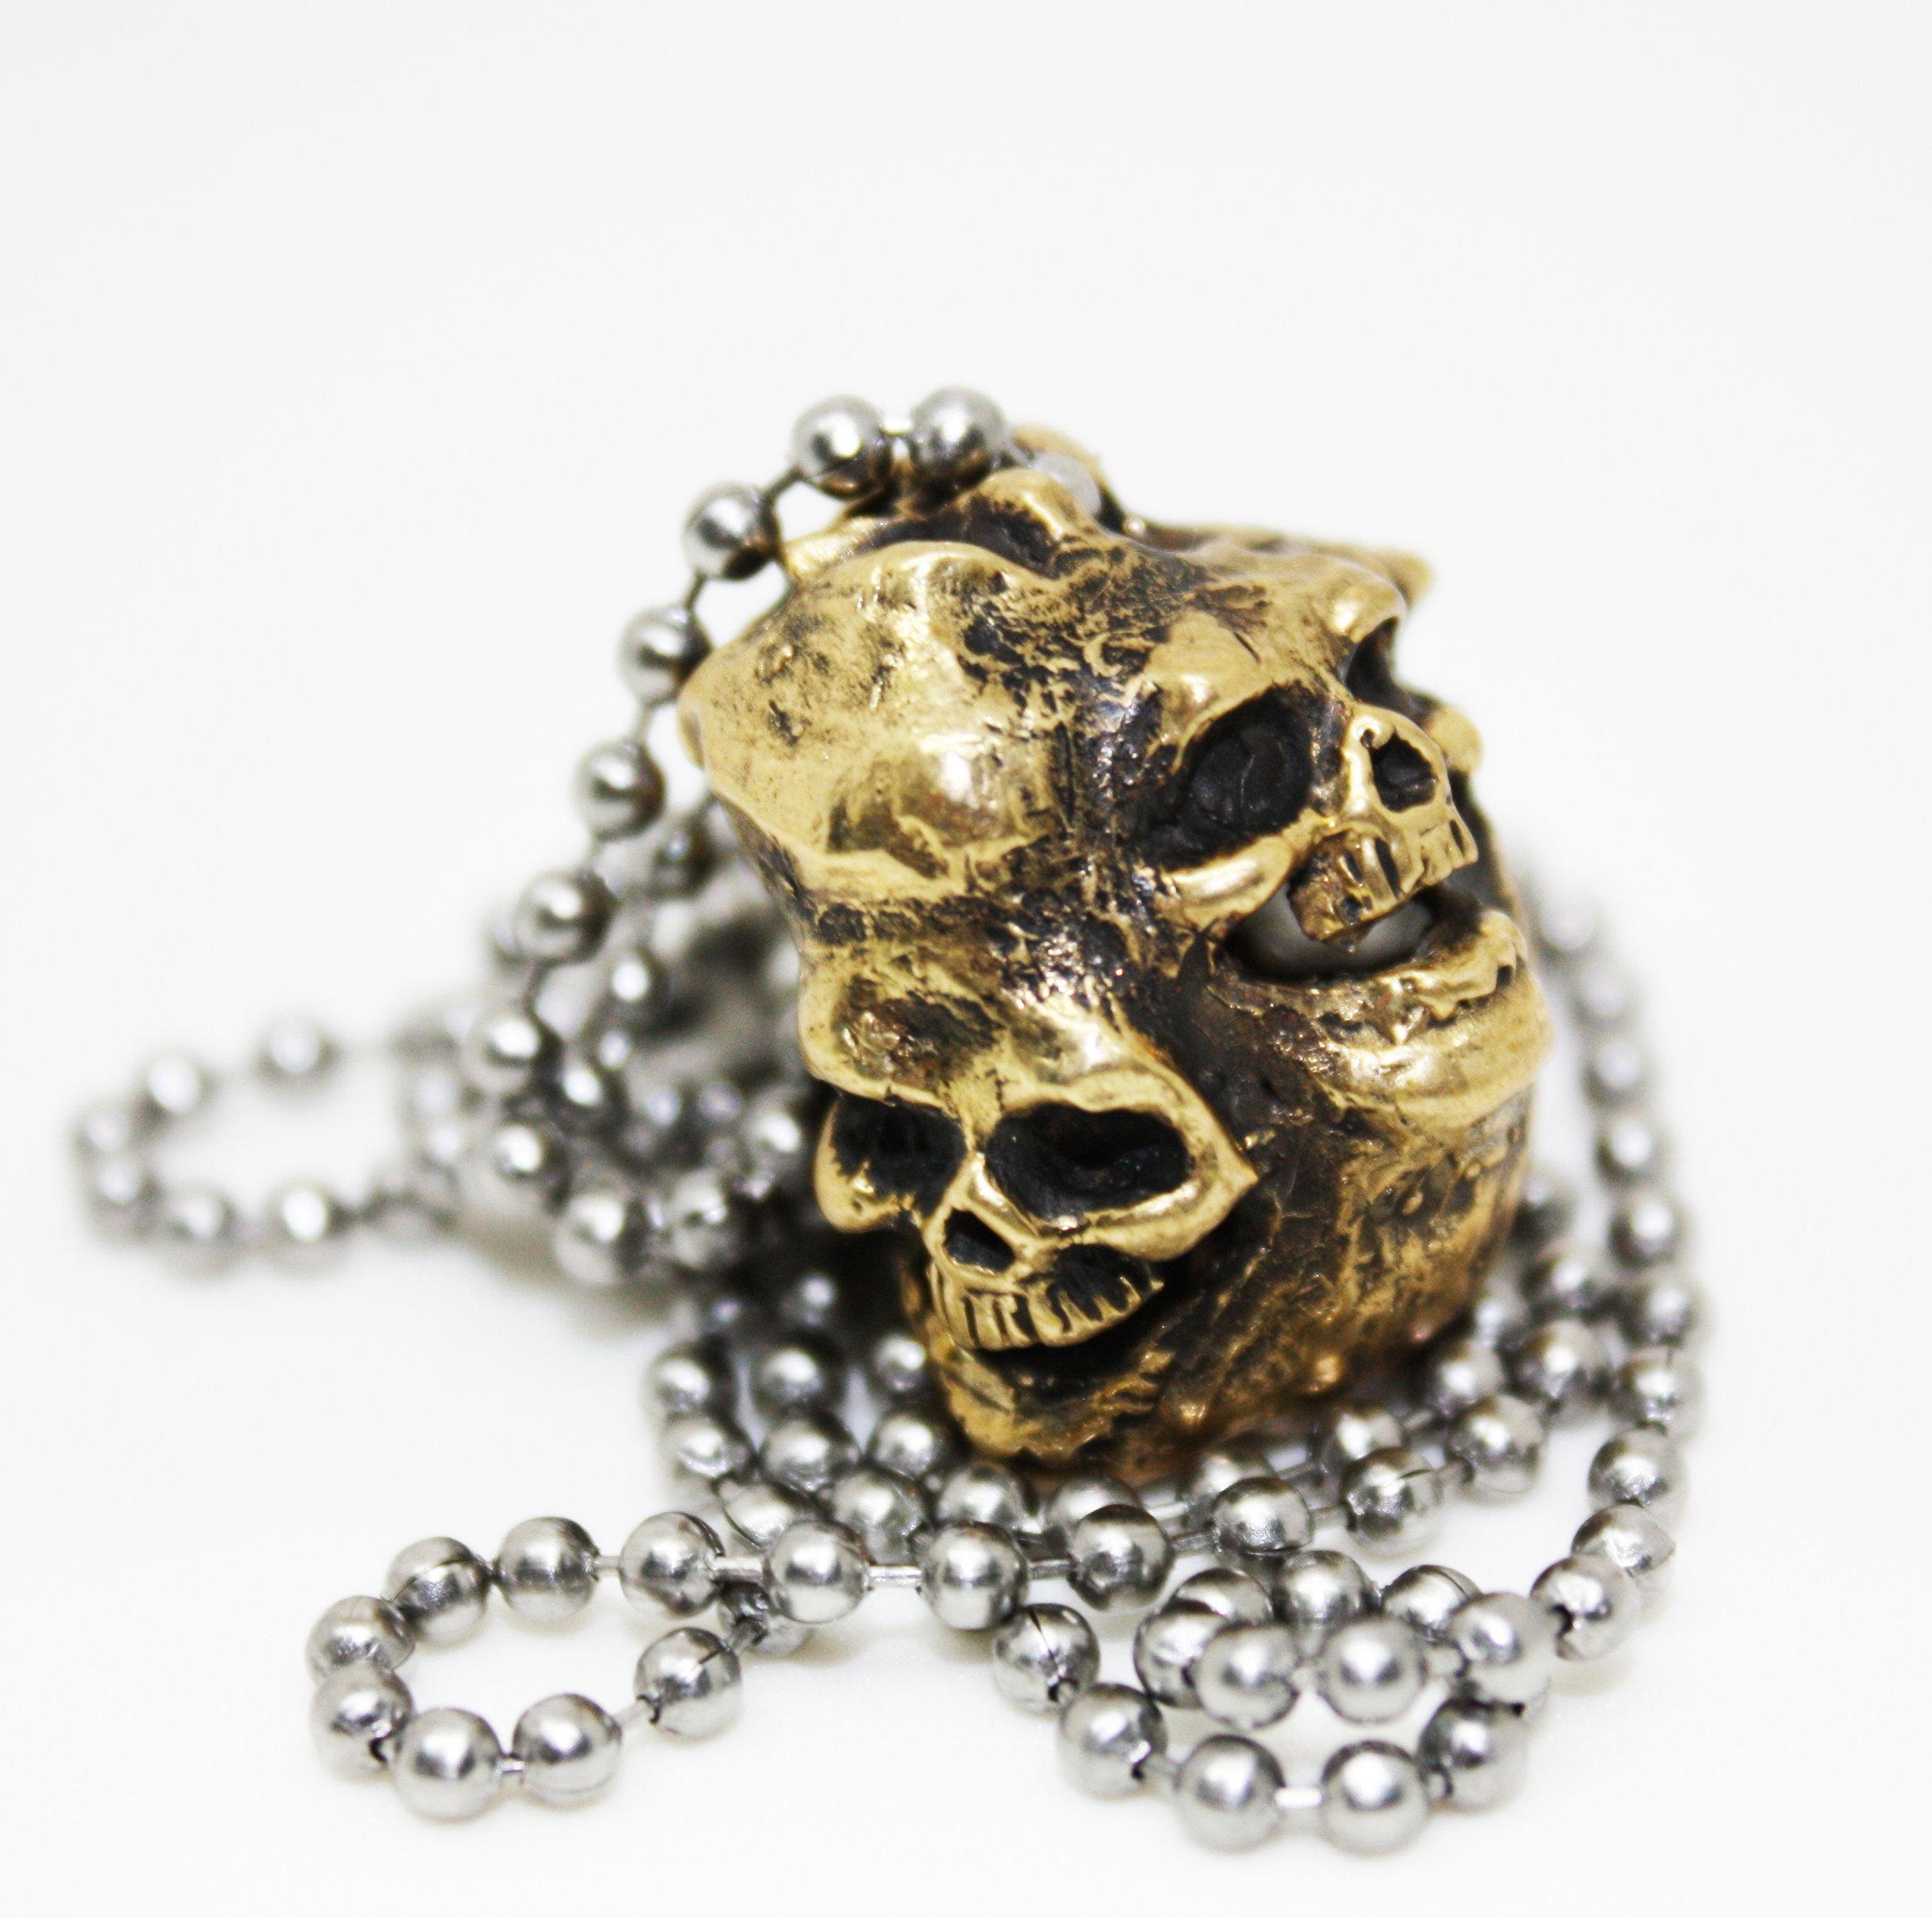 Laughing Skulls Pendant - Bronze